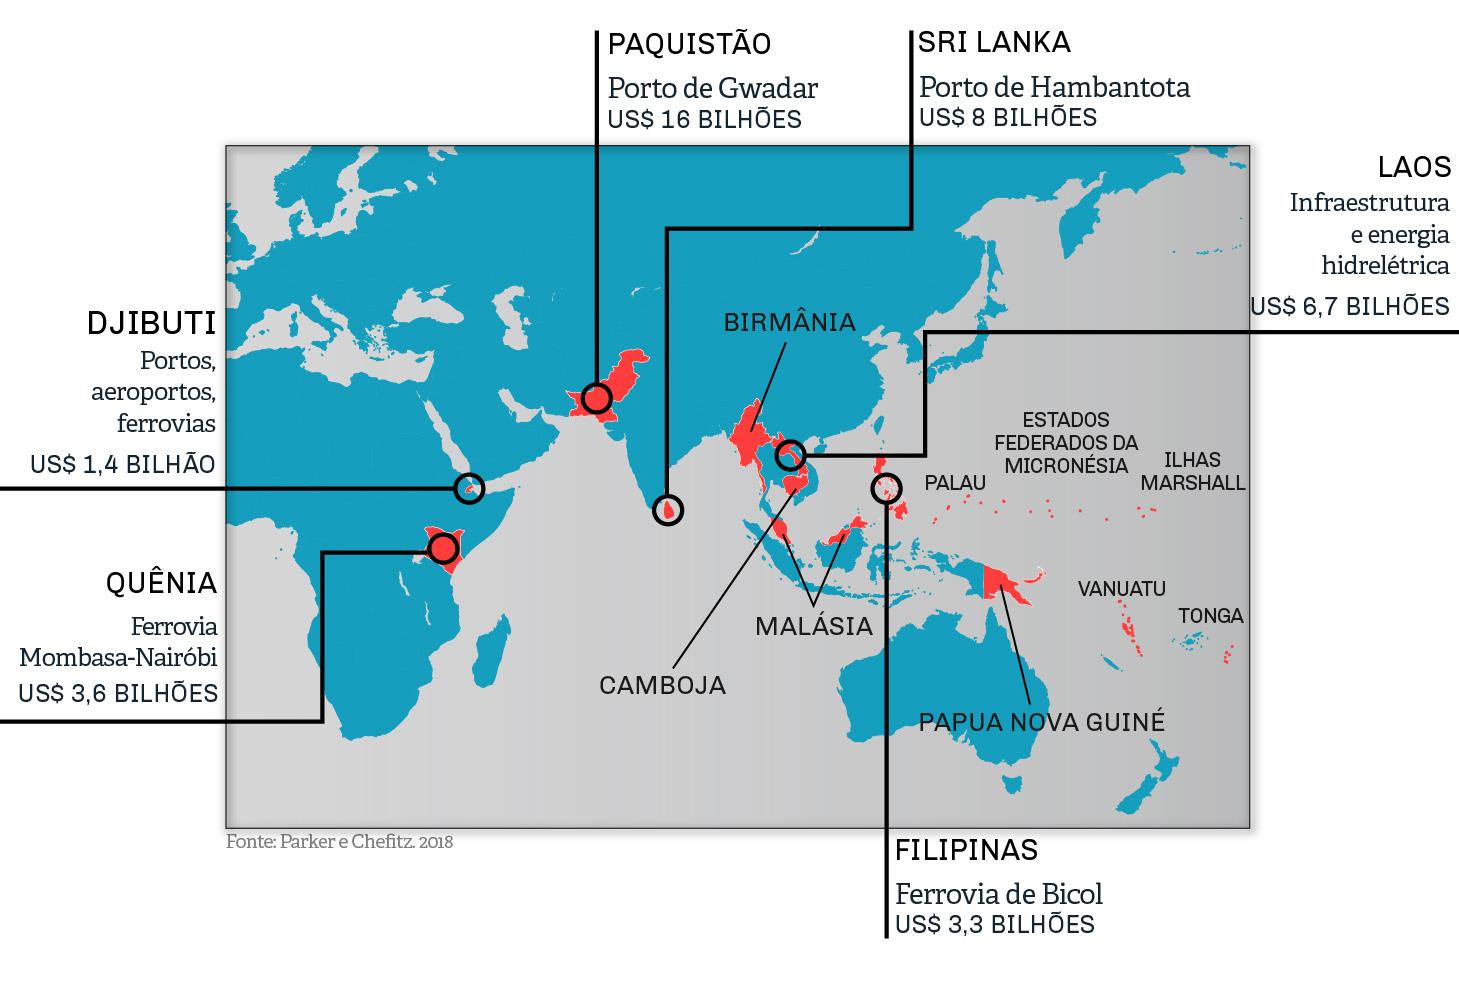 Mapa mostra alguns países selecionados e sua dívida decorrente de projetos específicos (Depto. De Estado/S. Gemeny Wilkinson)